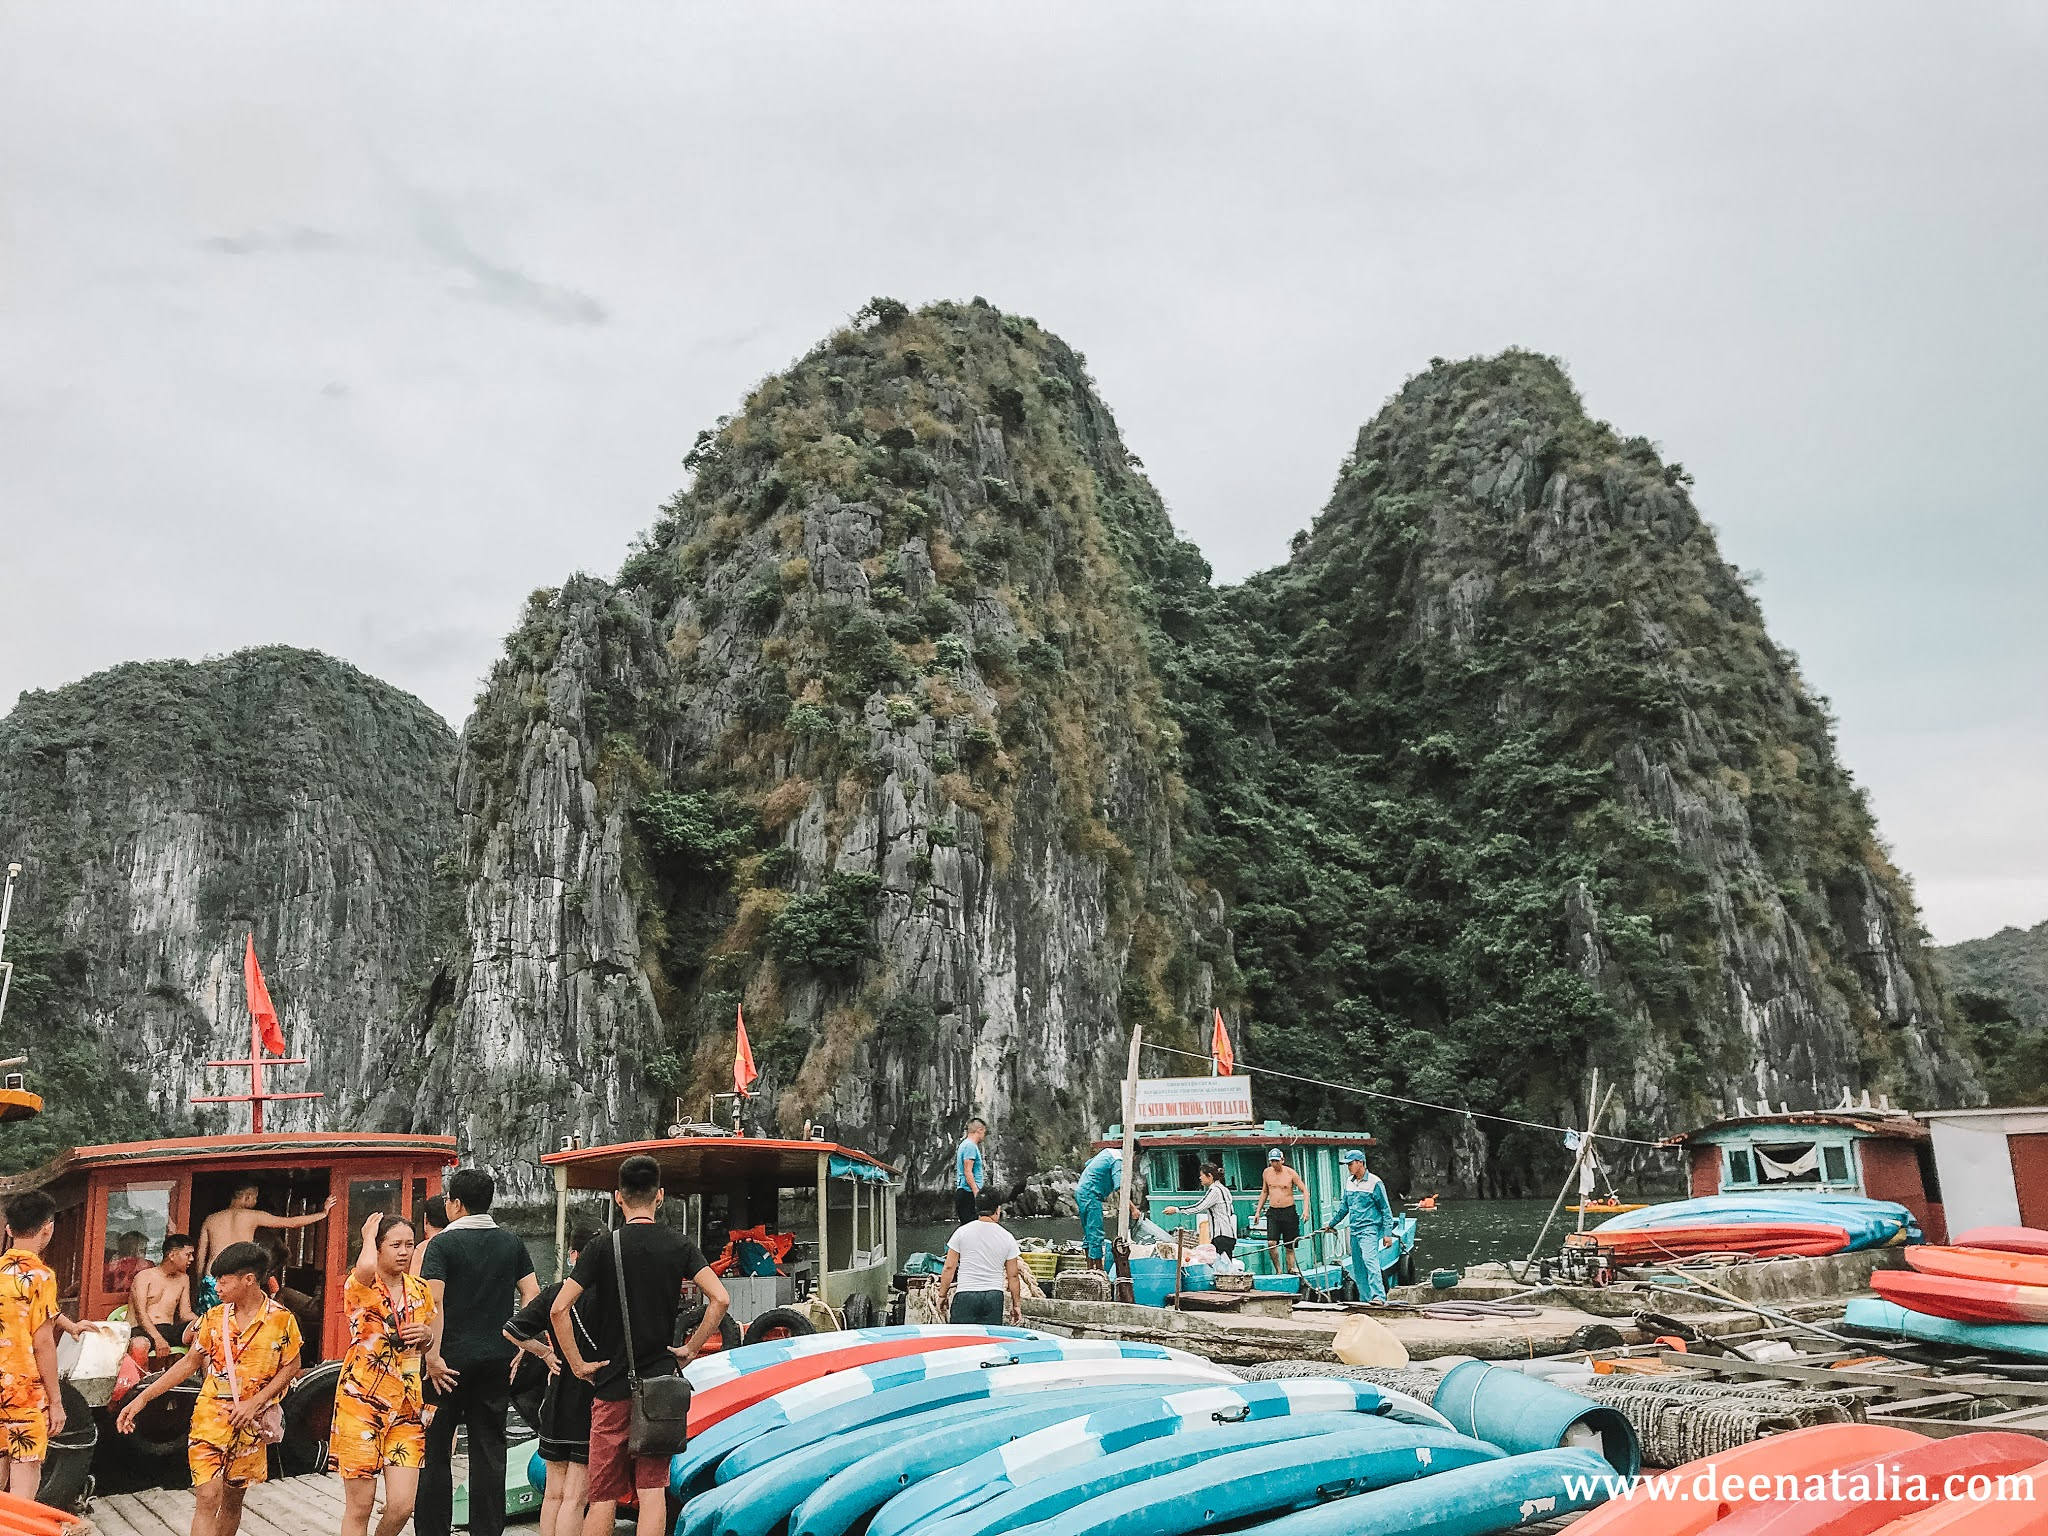 Cai Beo Village